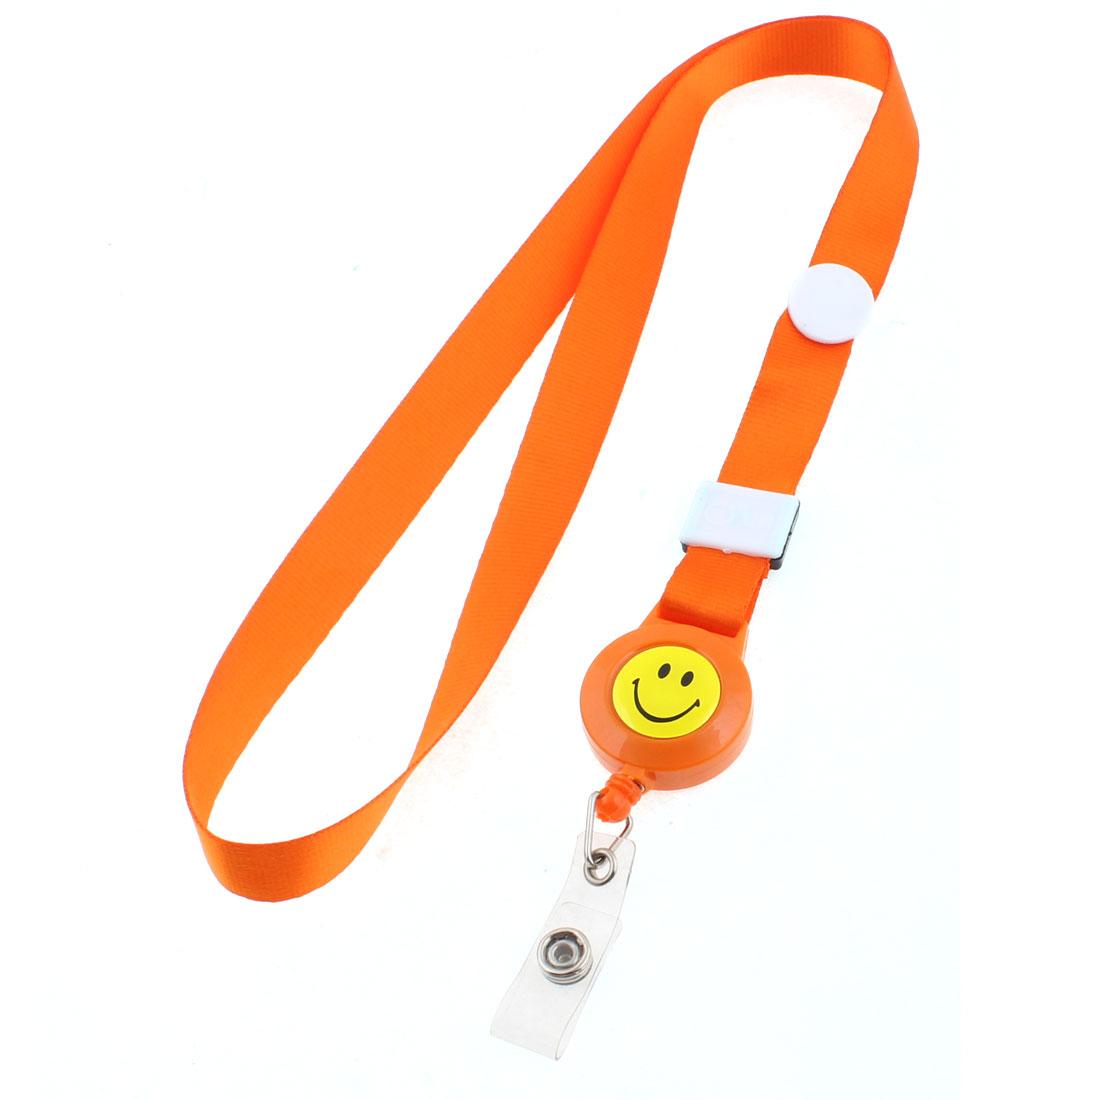 Smile Face Pattern Company Exhibition Work ID Card Holder Neck Strap Orange